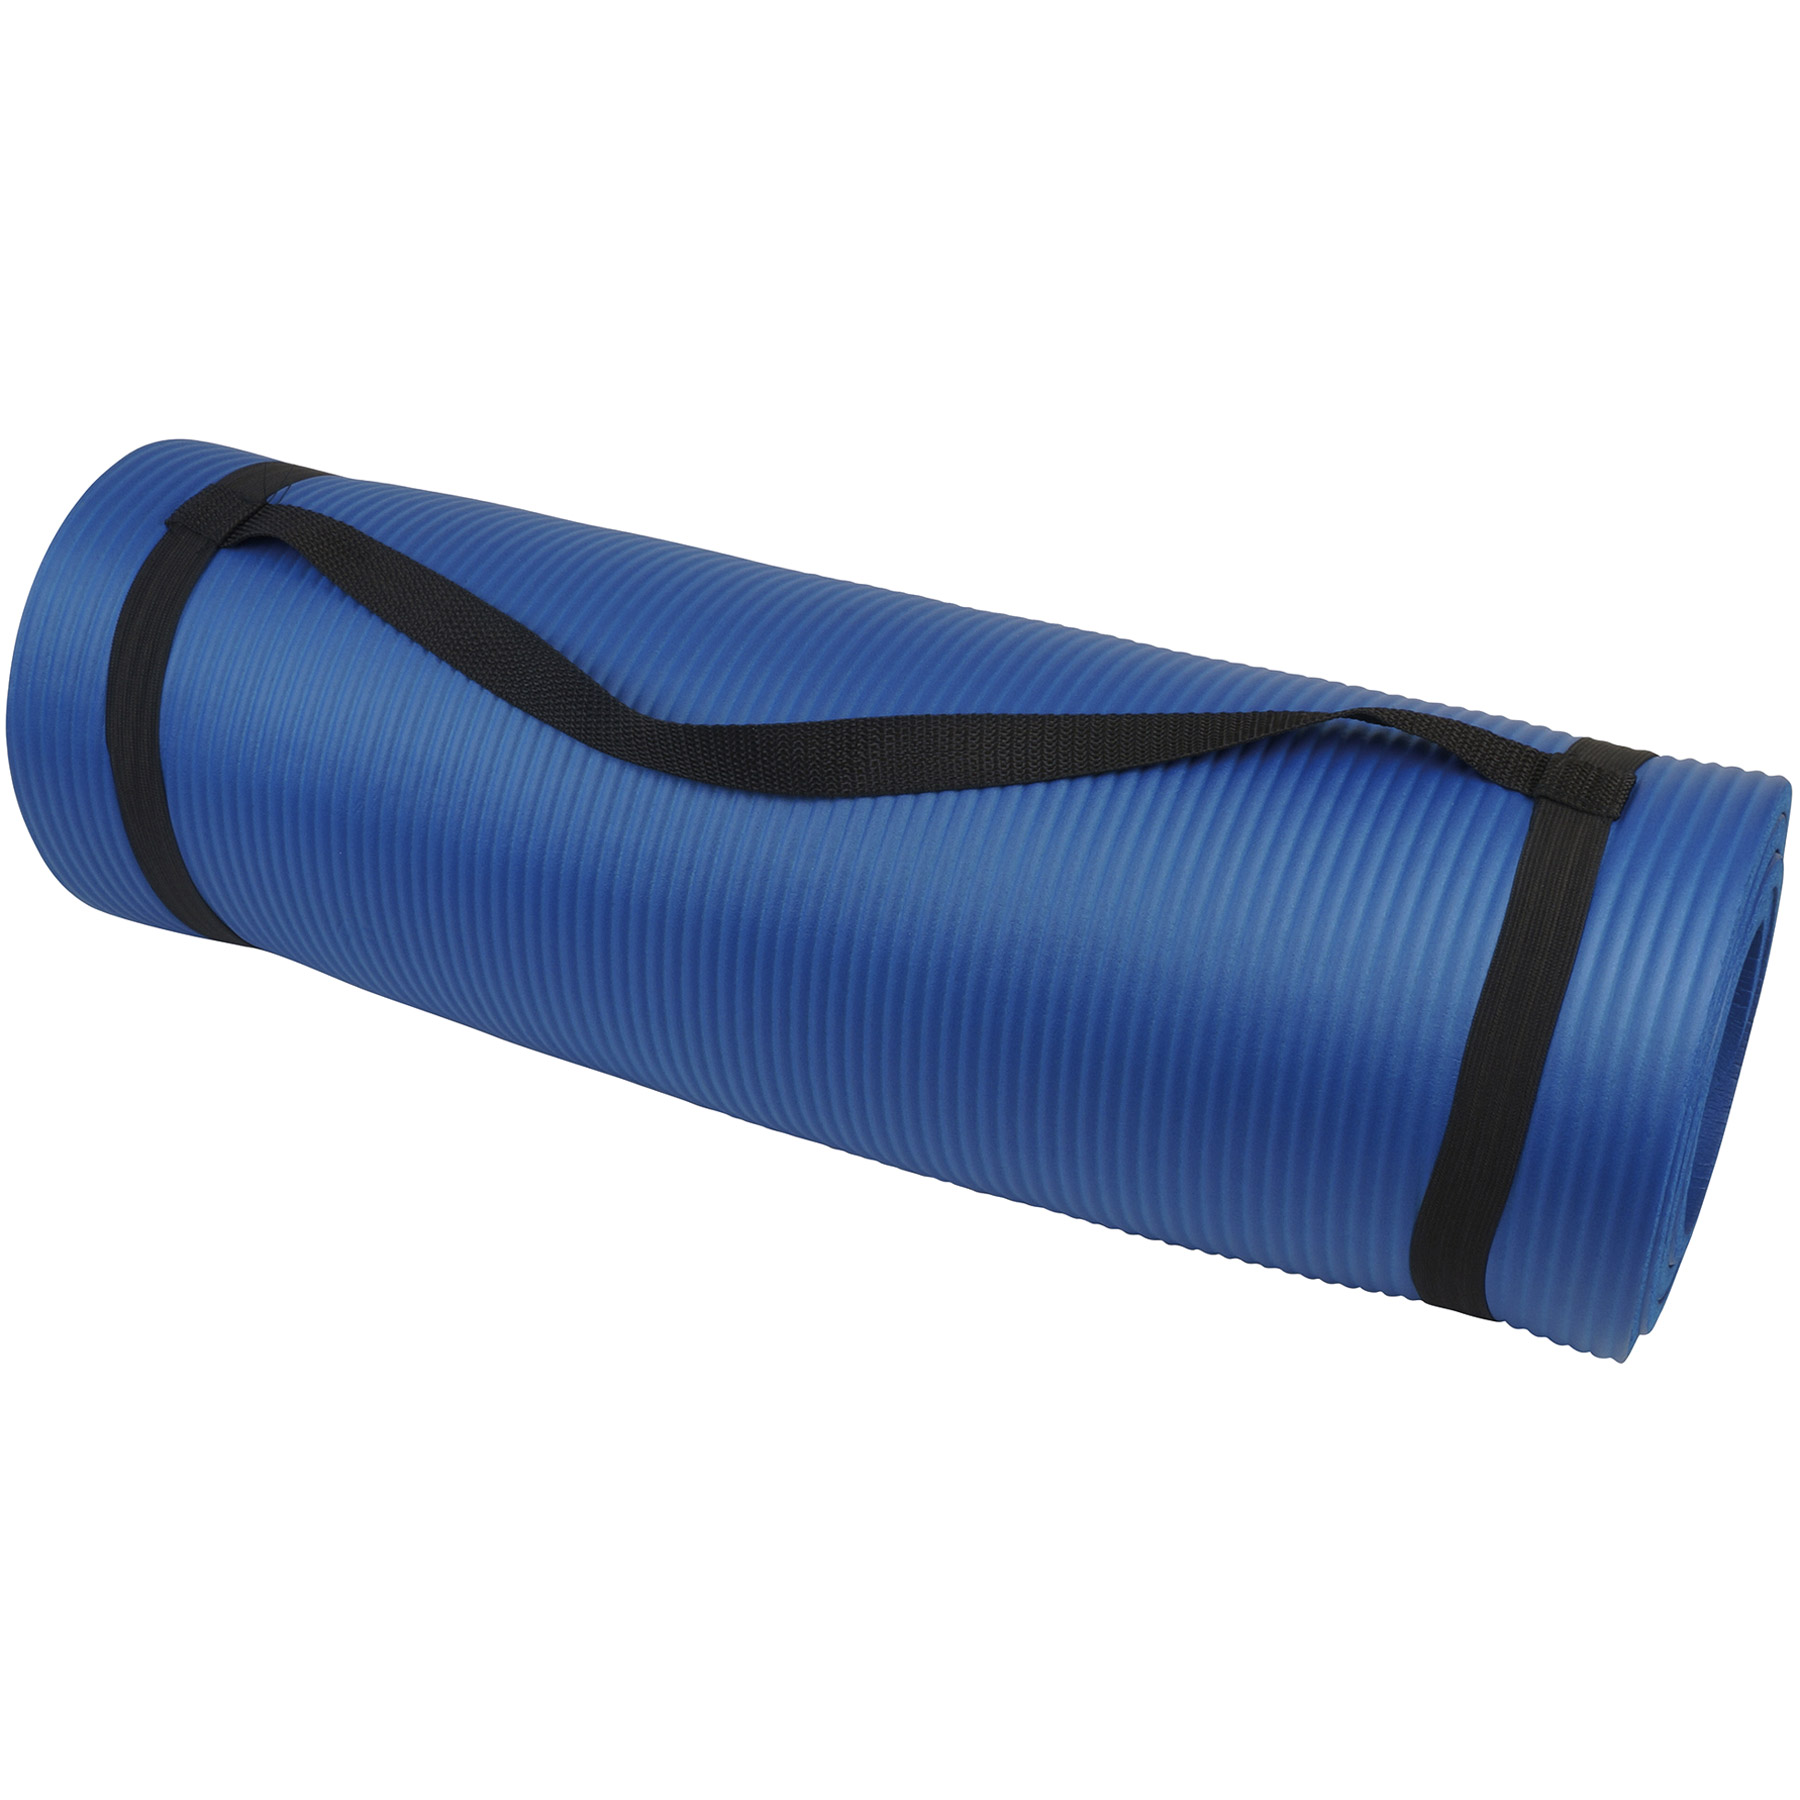 ufe nbr fitness tapis gym exercice pilates yoga - Tapis Gym